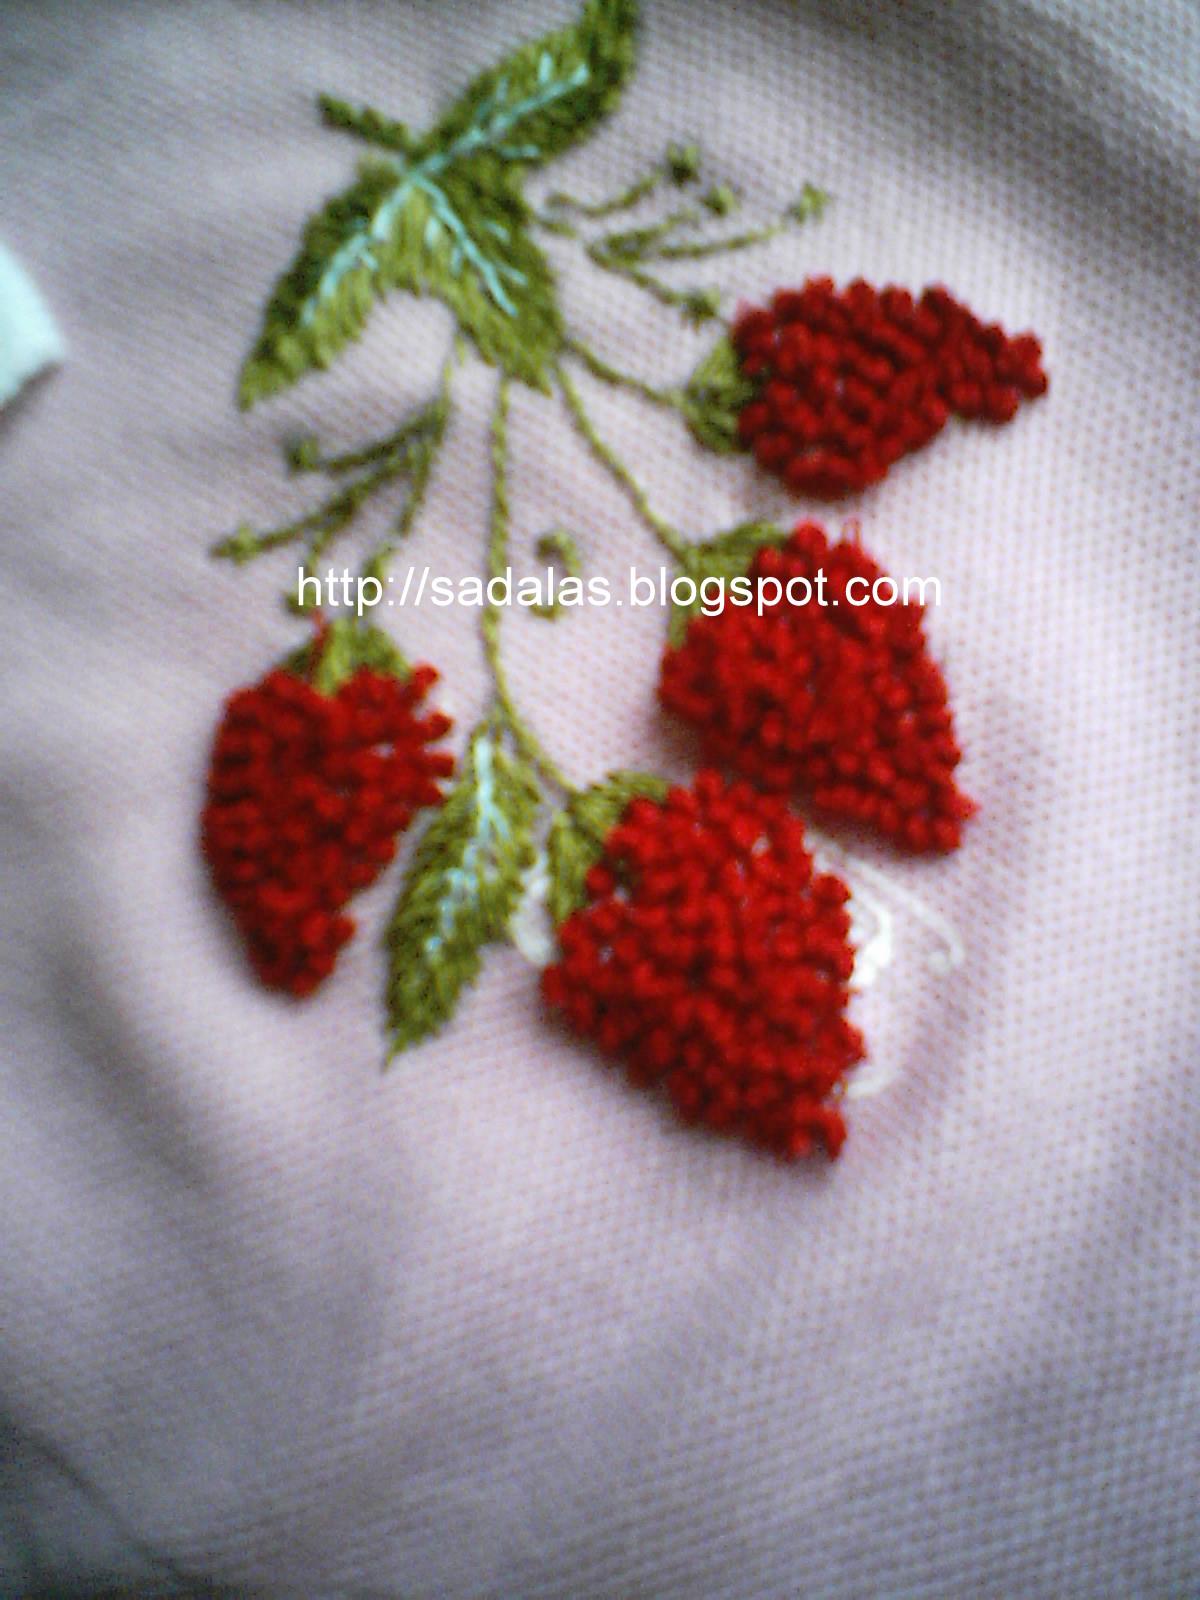 French Knot Stitch Embroidery Designs | www.imgkid.com ...